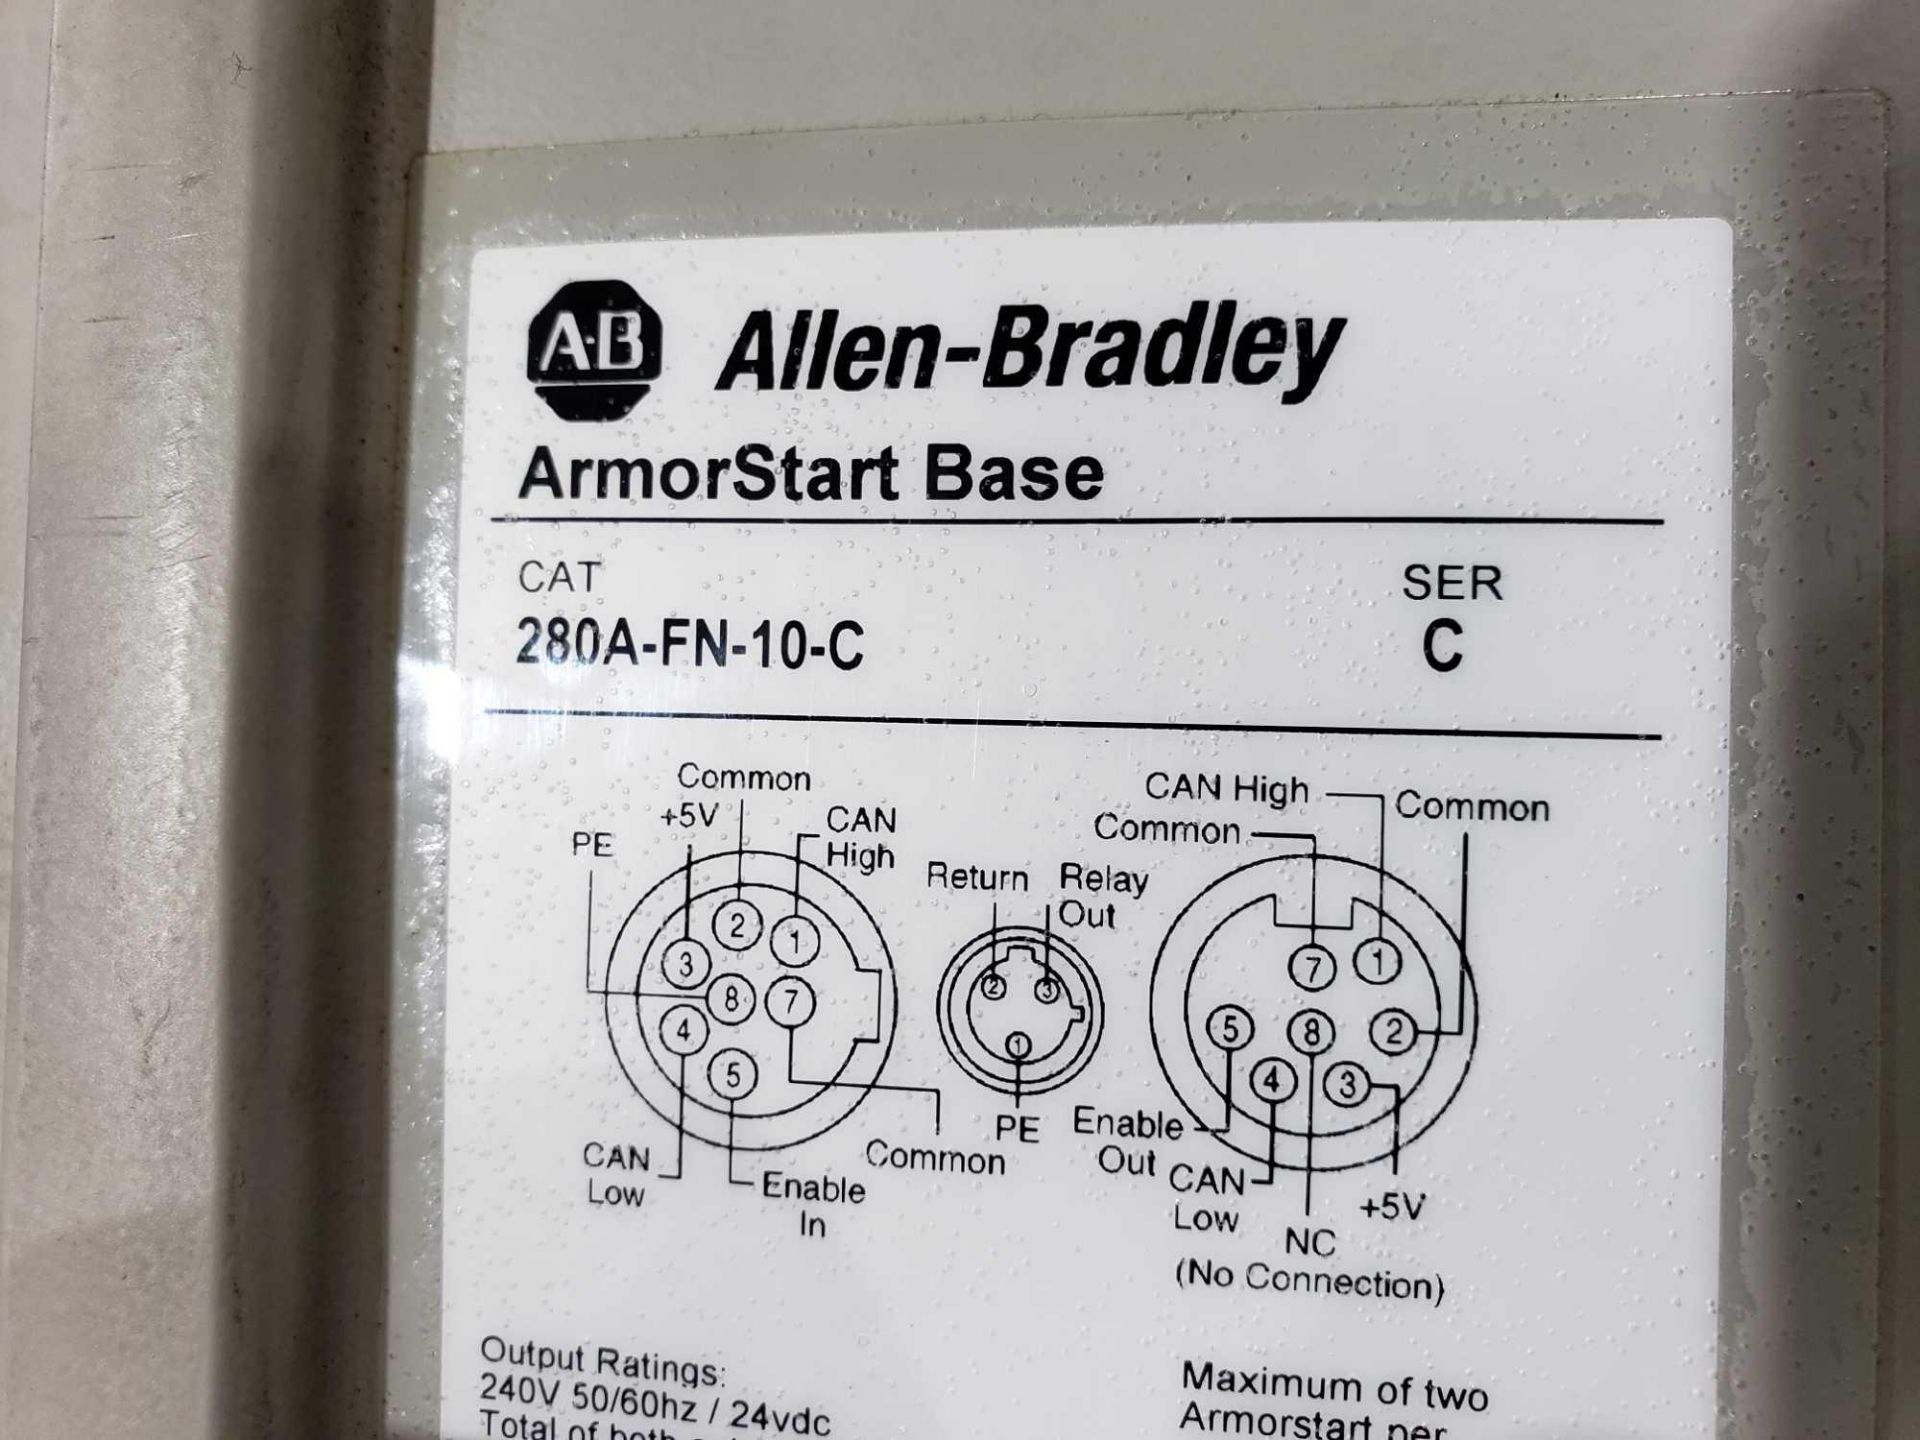 Lot 2 - Allen Bradley Armorstart Catalog 281A-F12Z-10A-CR with base Catalog 280A-FN-10C.